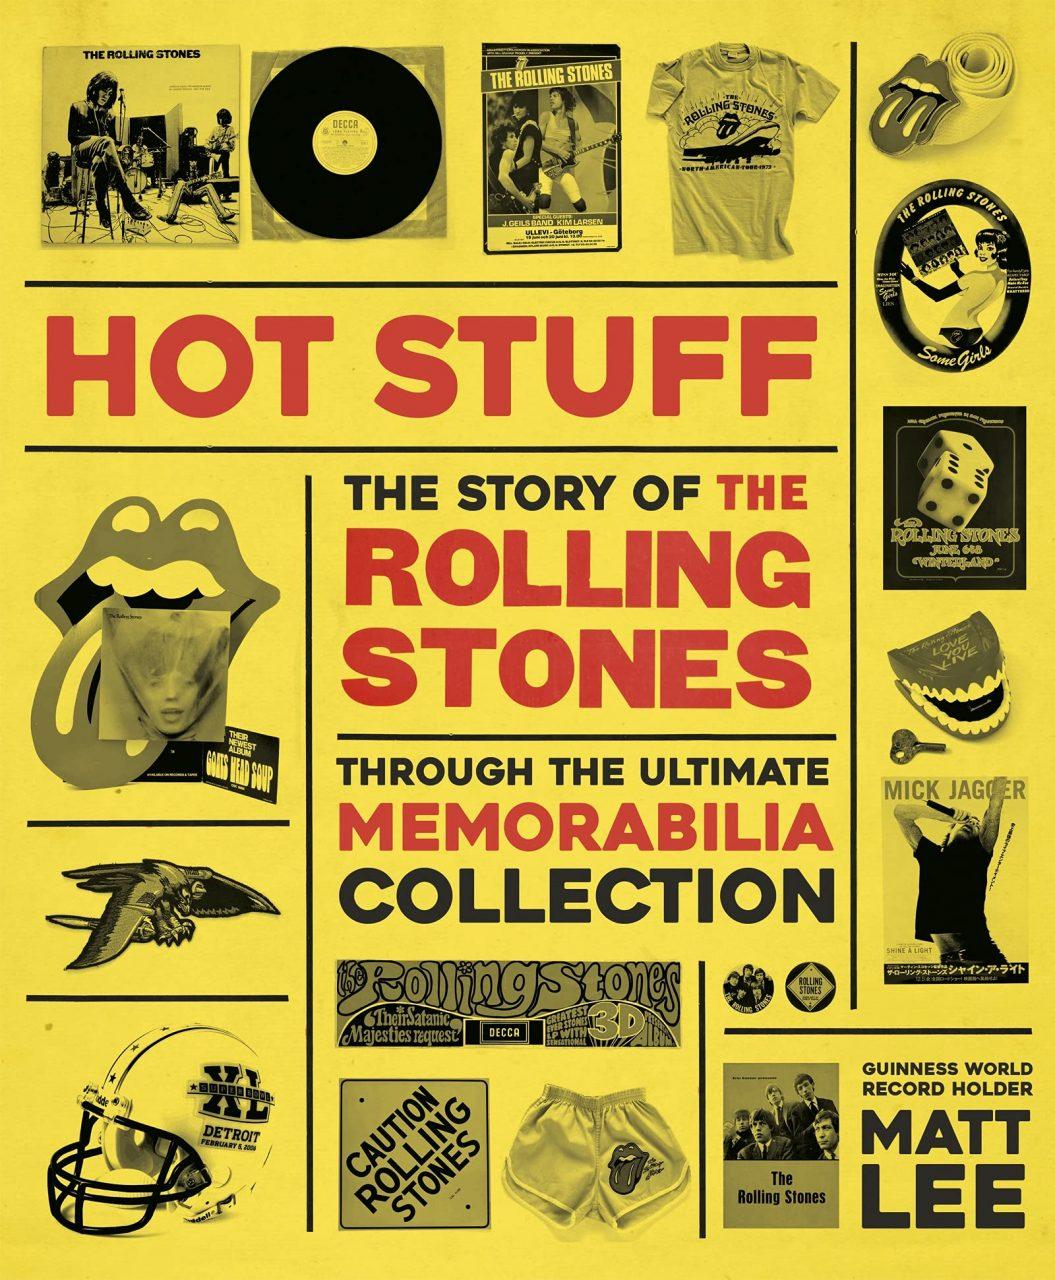 Rolling Stones - Hot Stuff: The Ultimate Memorabilia Collection Book Cover.